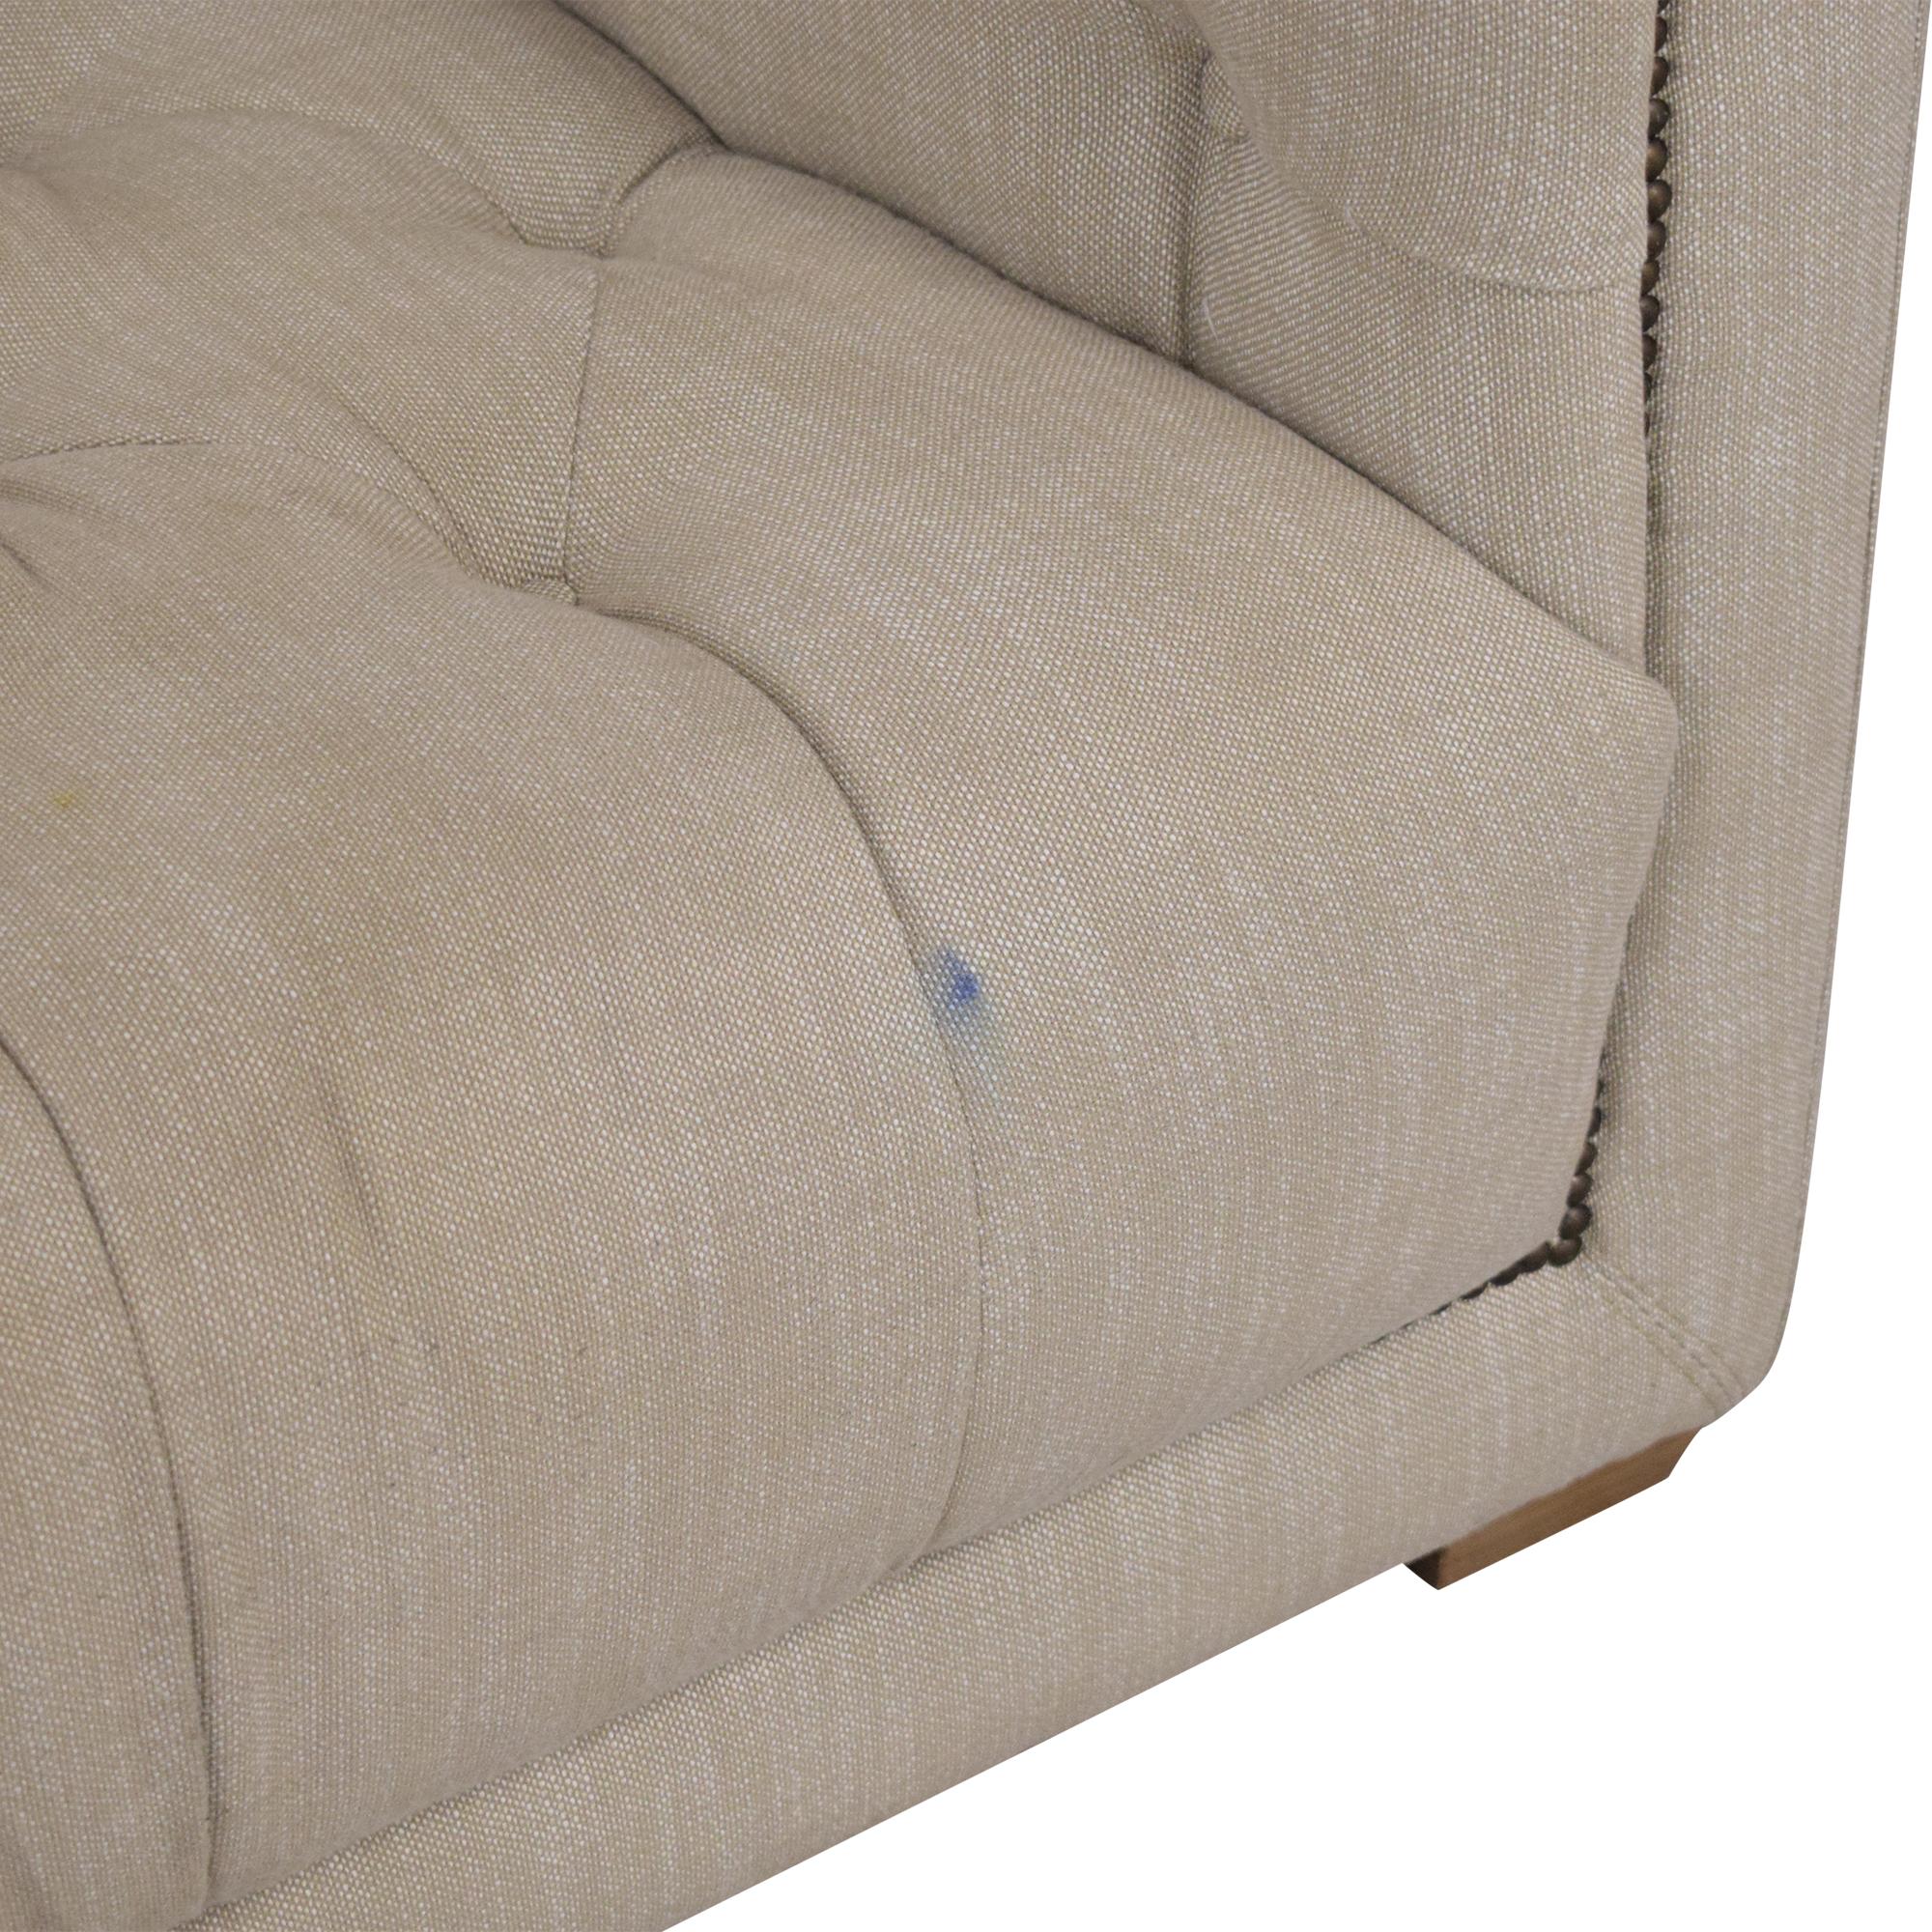 buy Restoration Hardware Savoy Sofa Restoration Hardware Classic Sofas